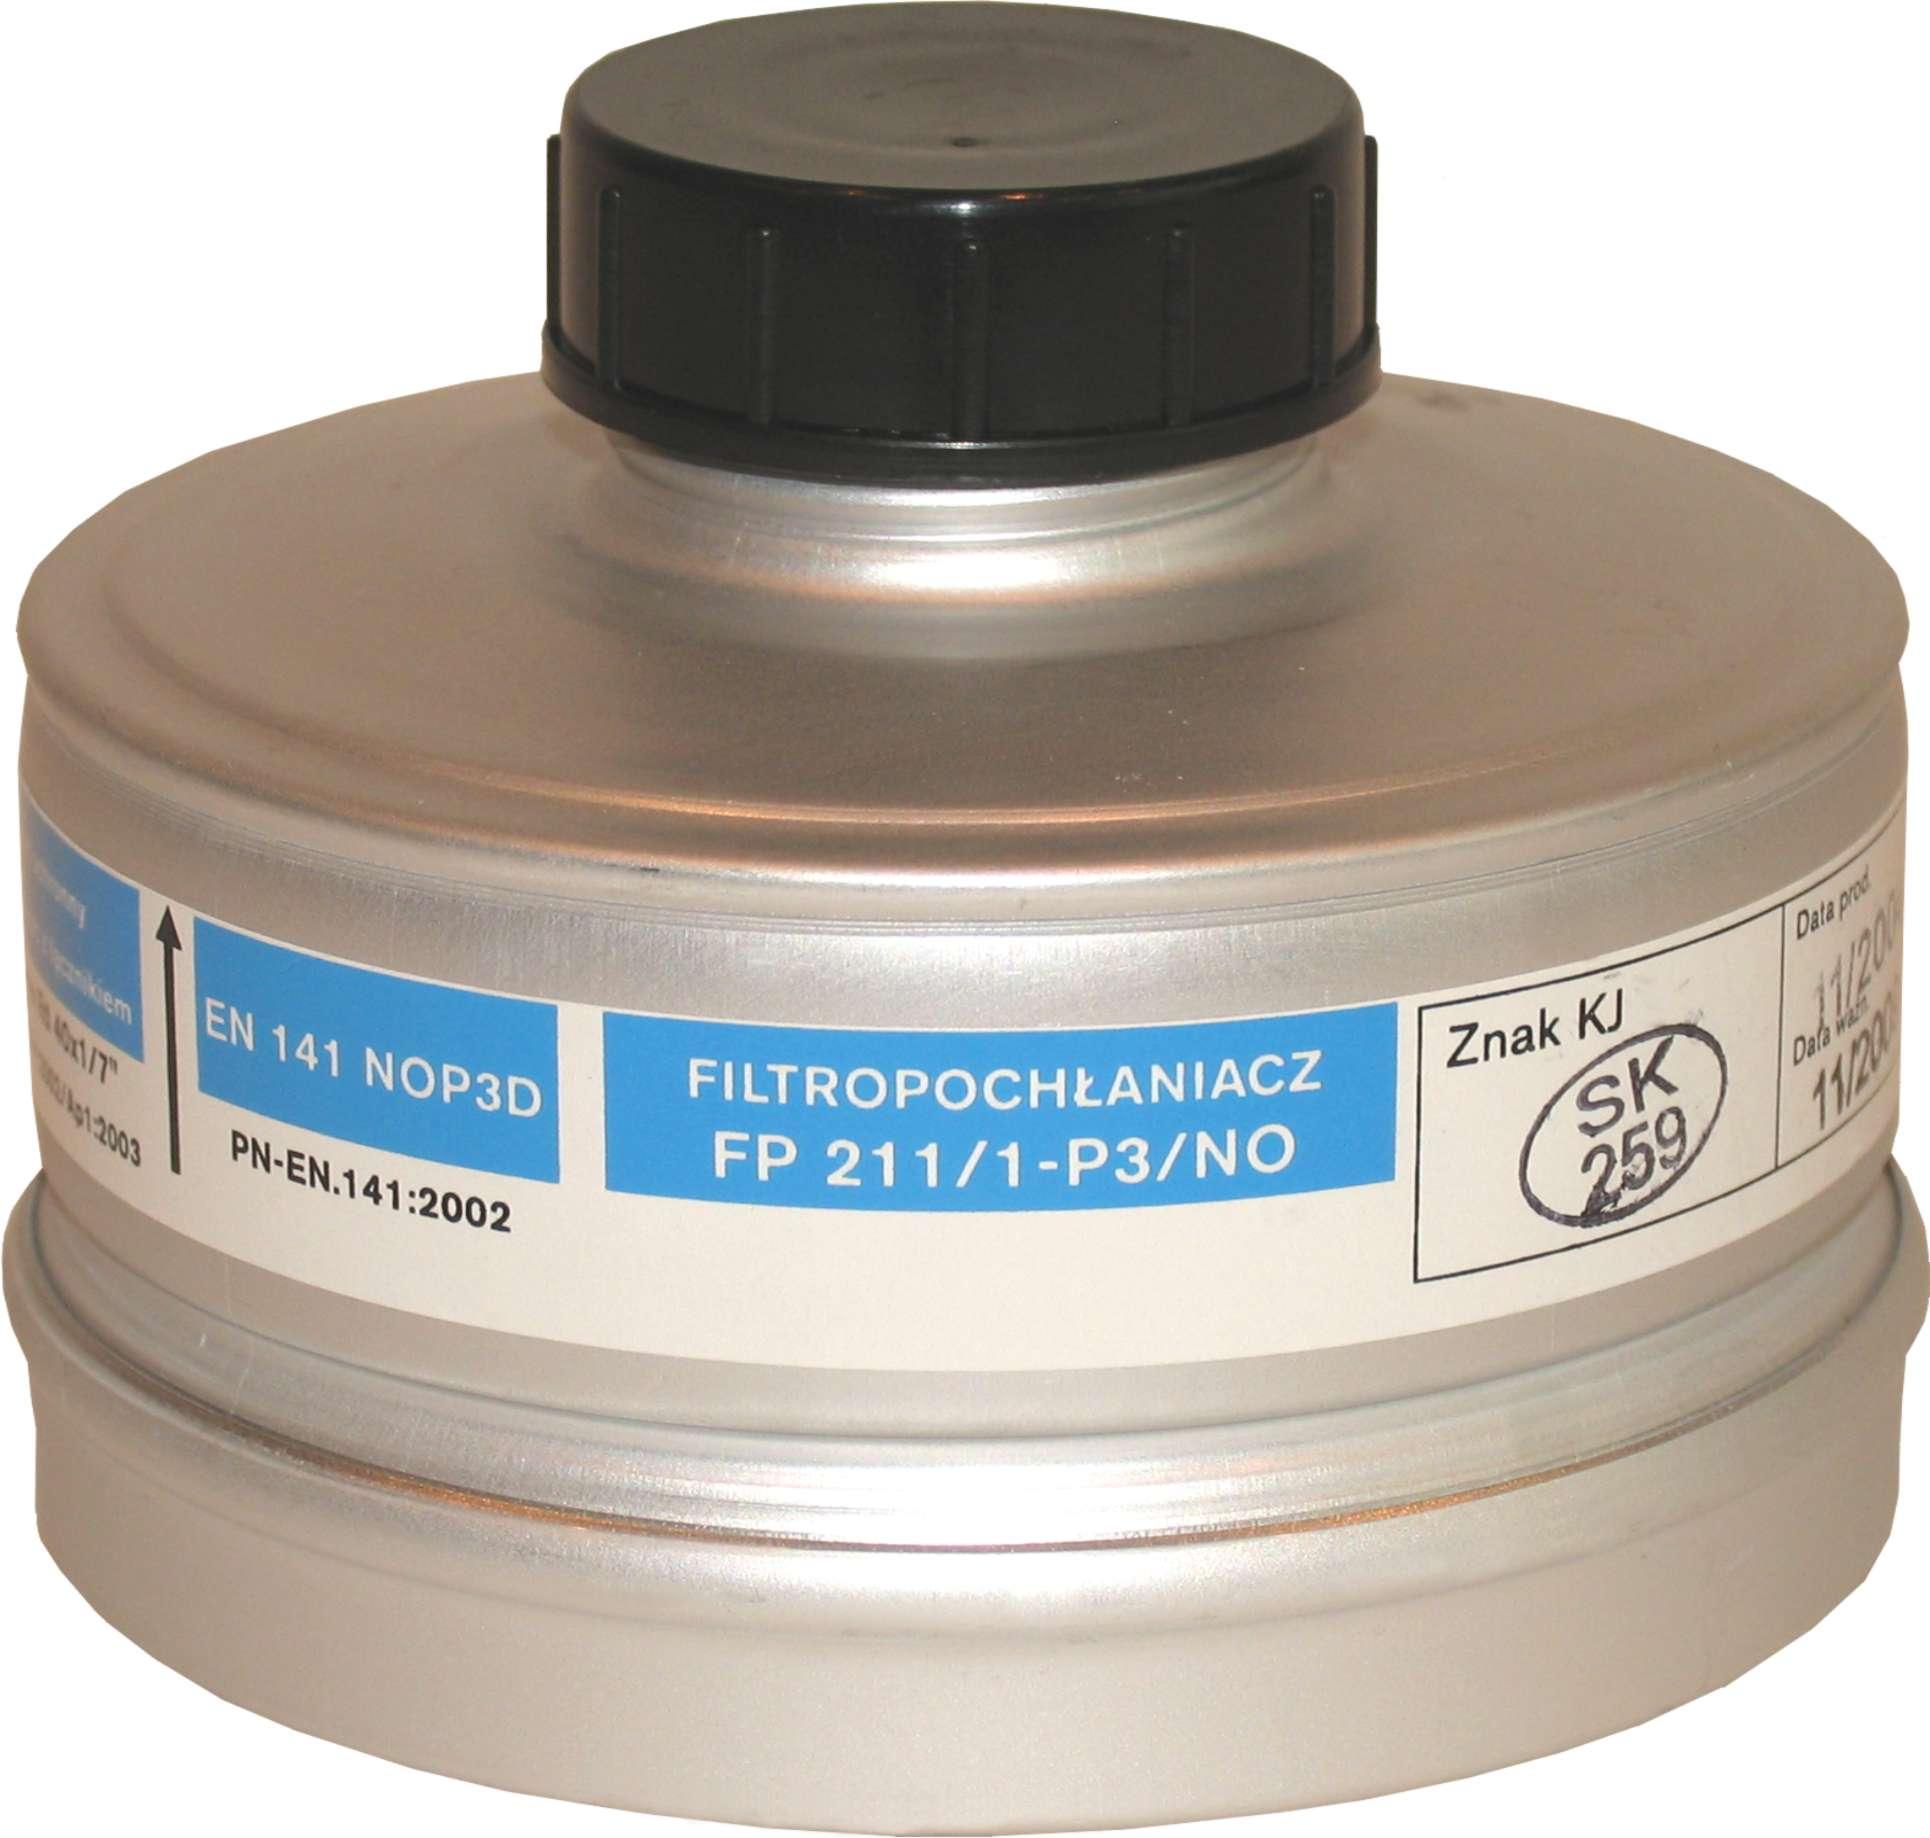 Filtropochłaniacz FP 211/1-P3/NO